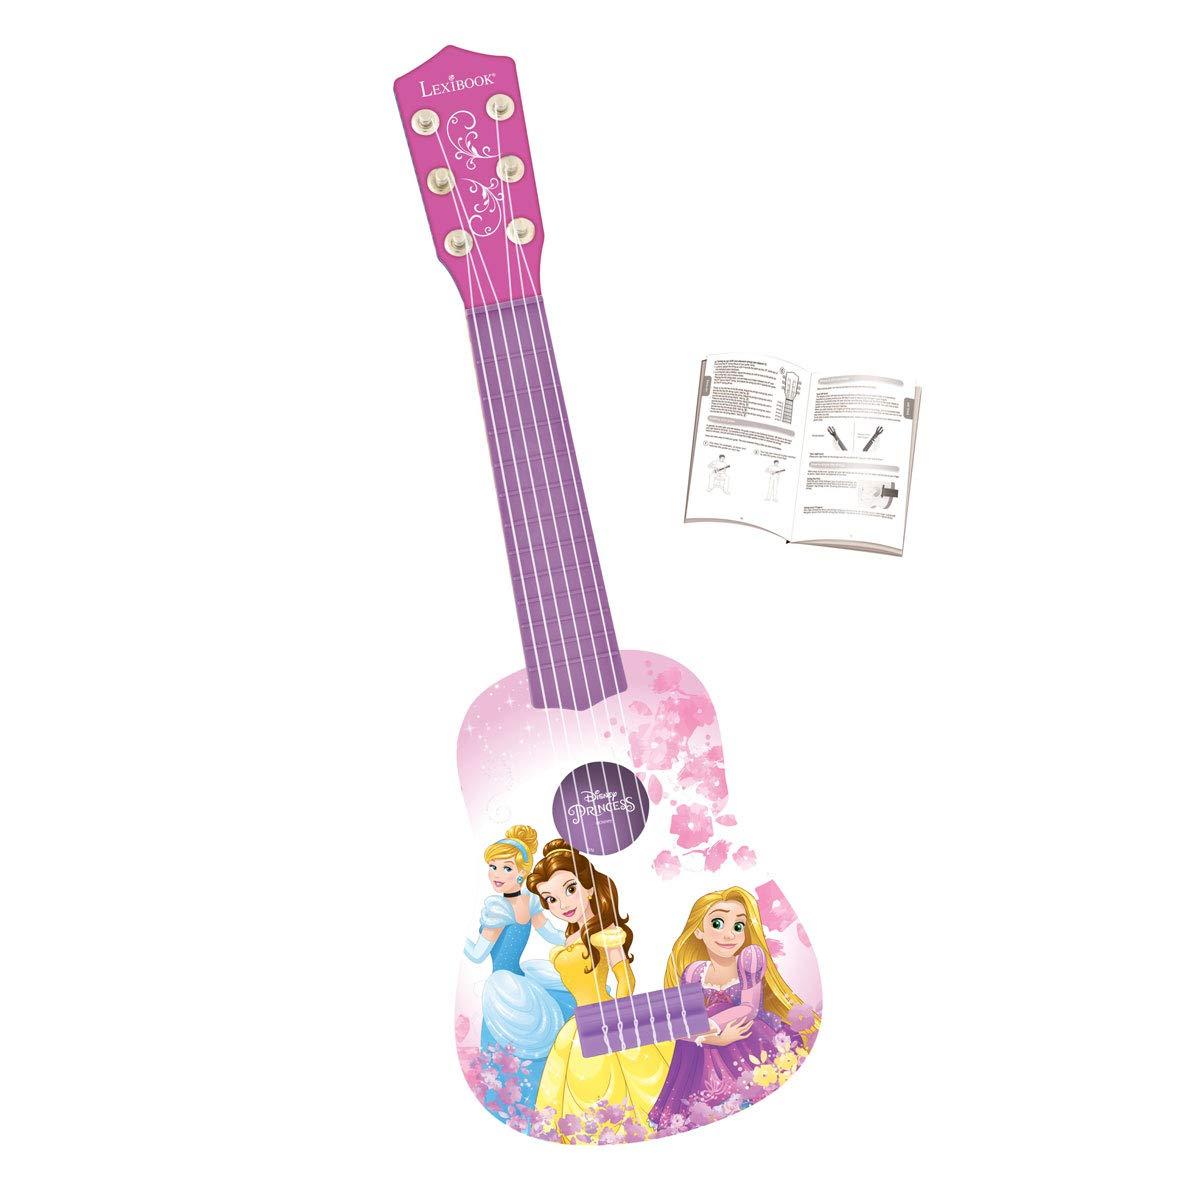 Lexibook Disney Princess Rapunzel My First Guitare Pink // Purple K200DP 53 cm 6 Nylon Strings Guide Included